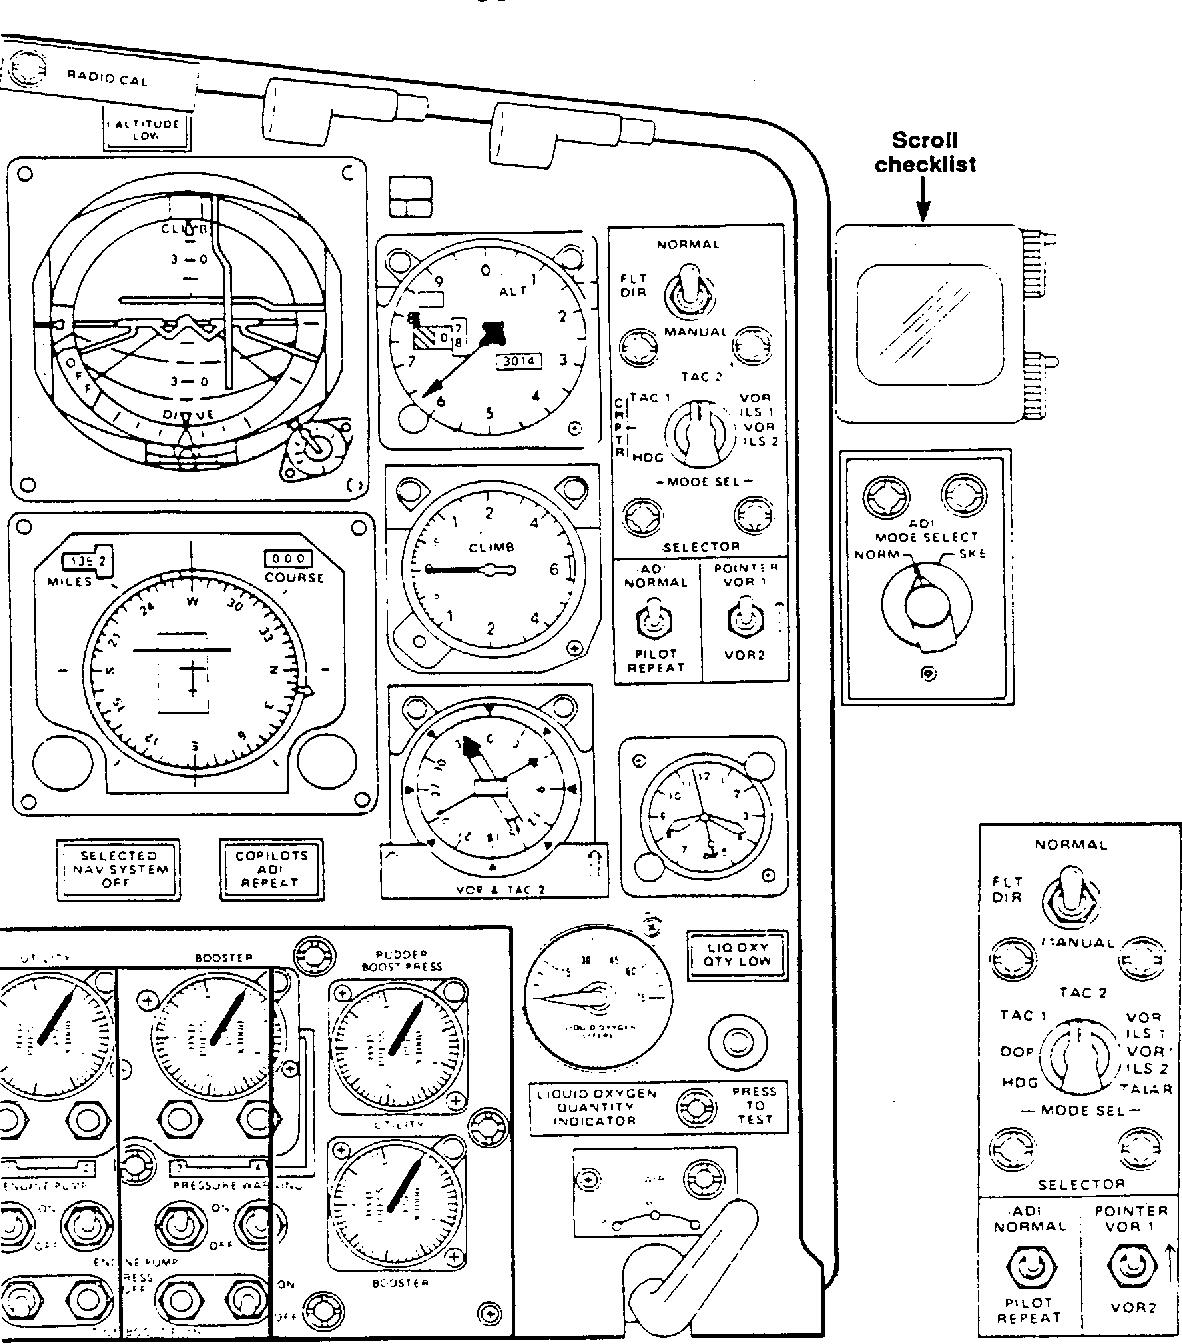 Airbus Checklist Pdf